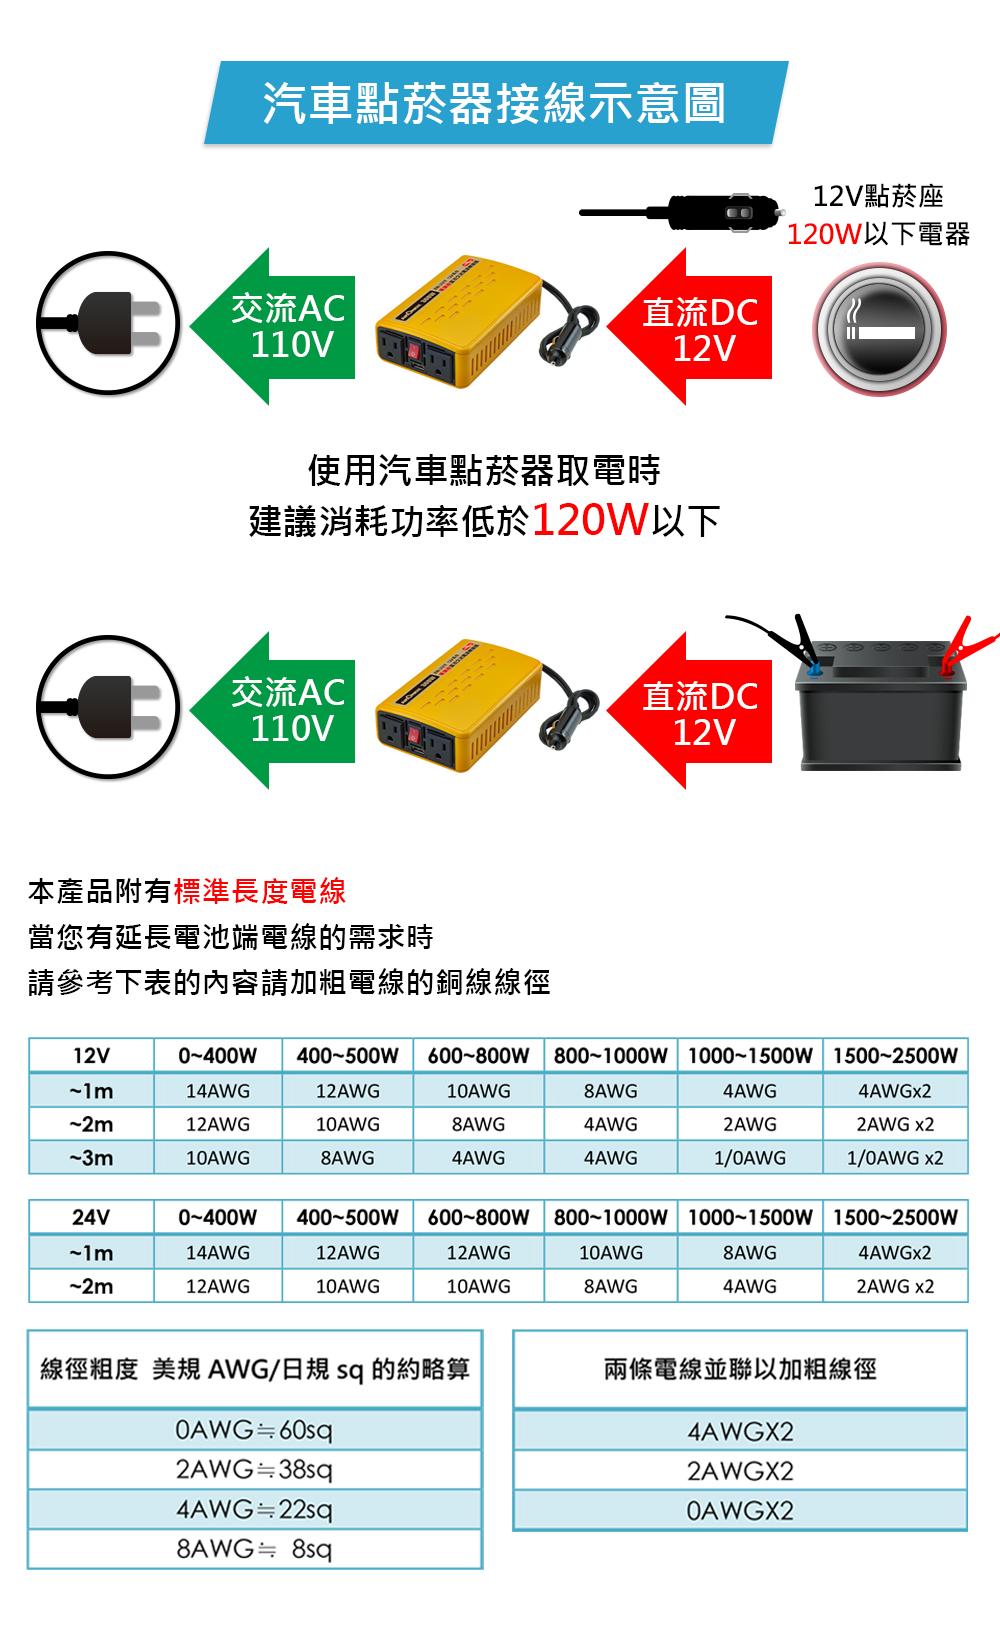 AUTOMAXX ★ XM-300T 12V300W 汽車電源轉換器說明